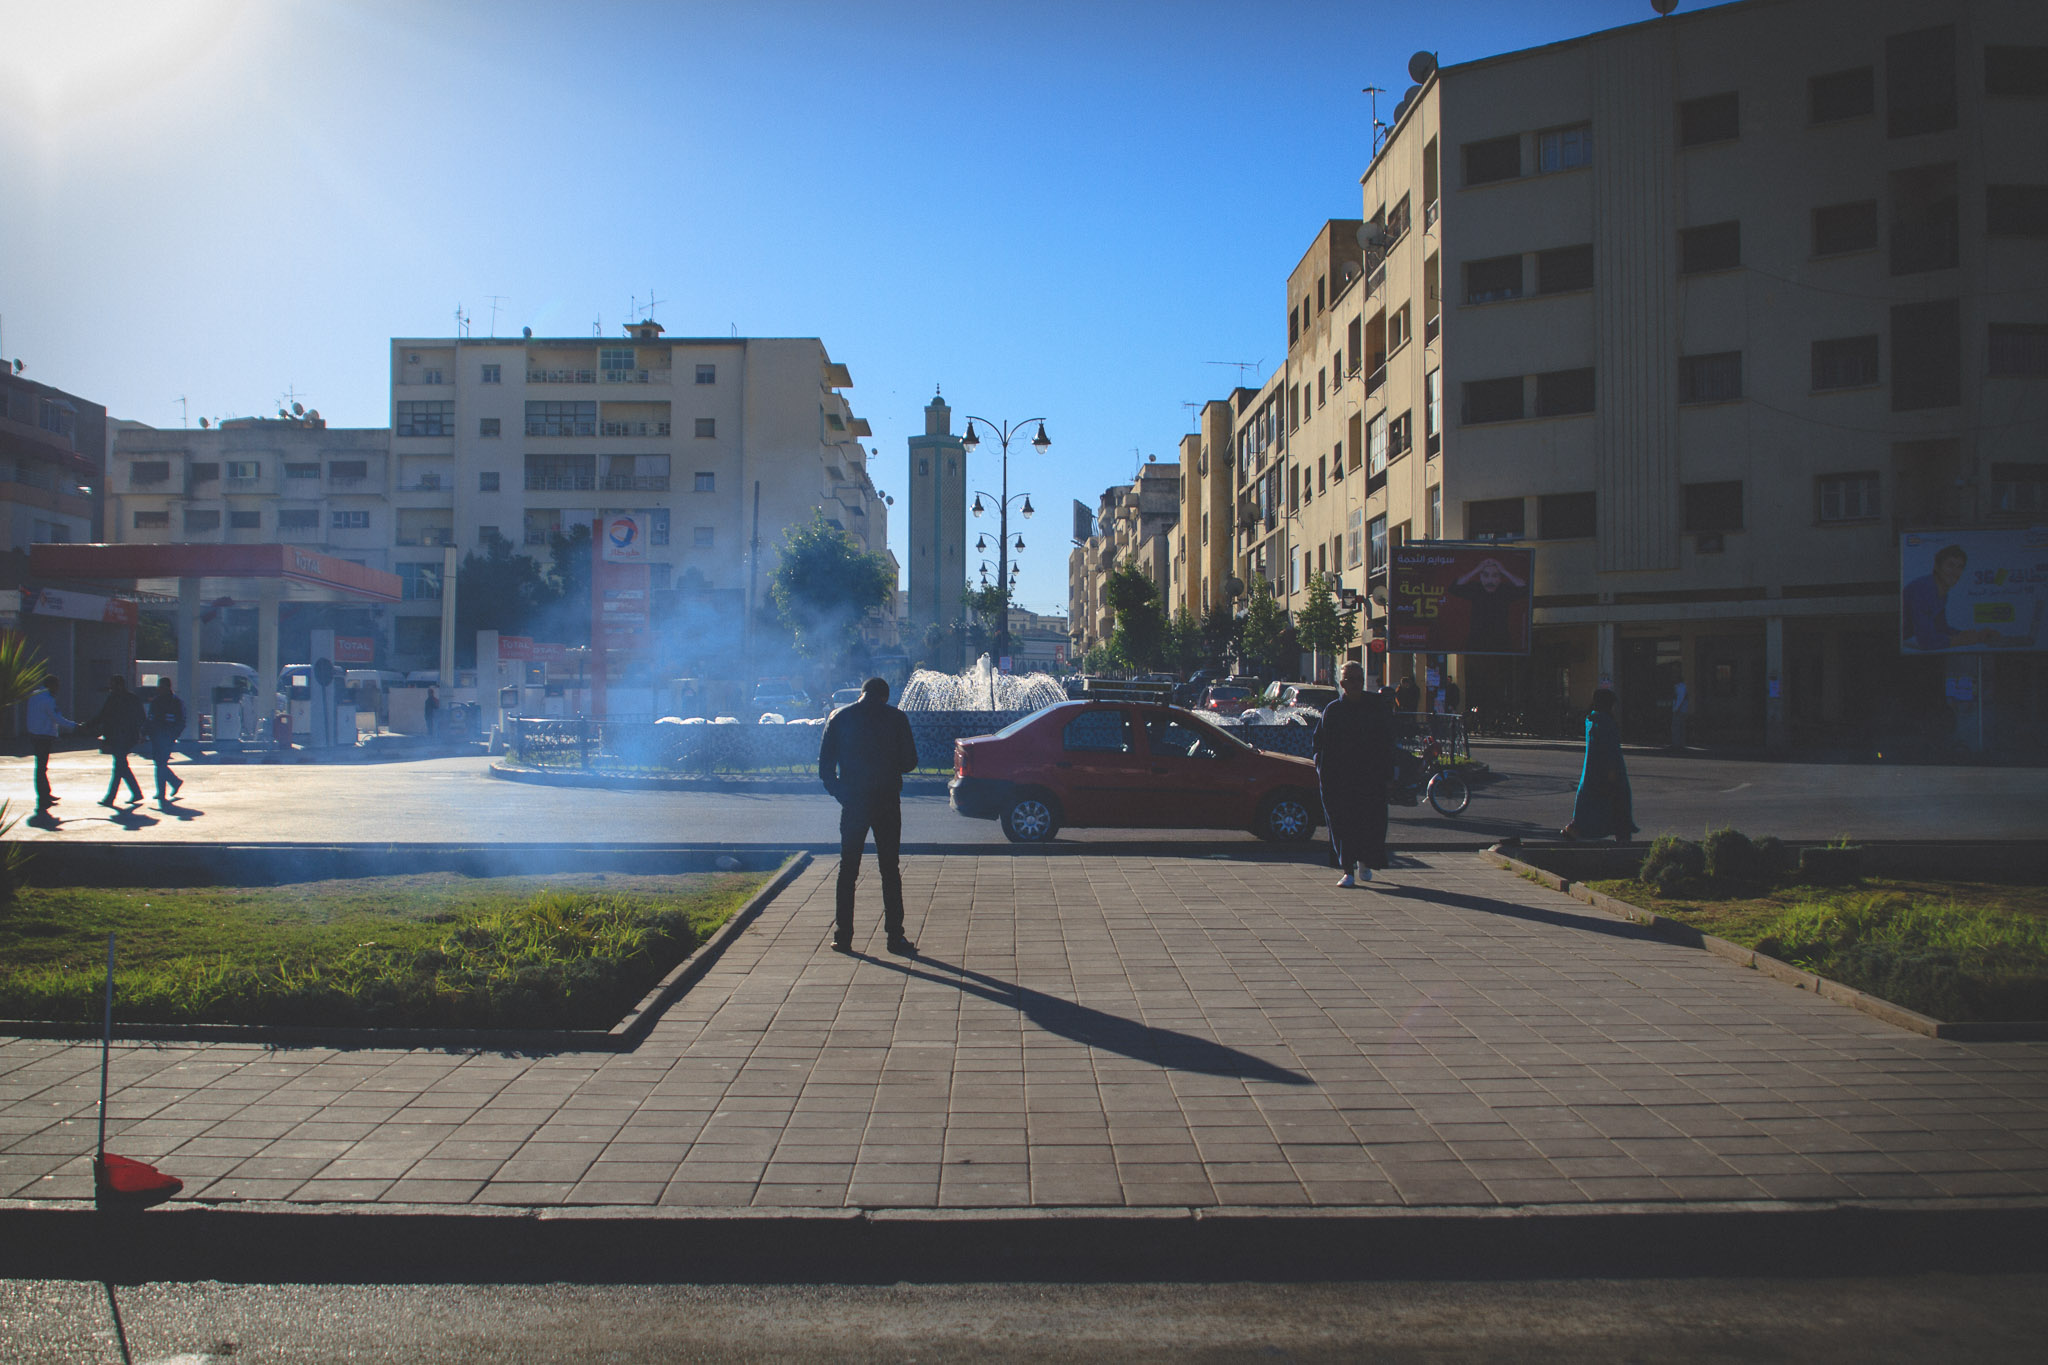 morocco_rabat_fez_casablanca_lesleyade_photography-18.jpg